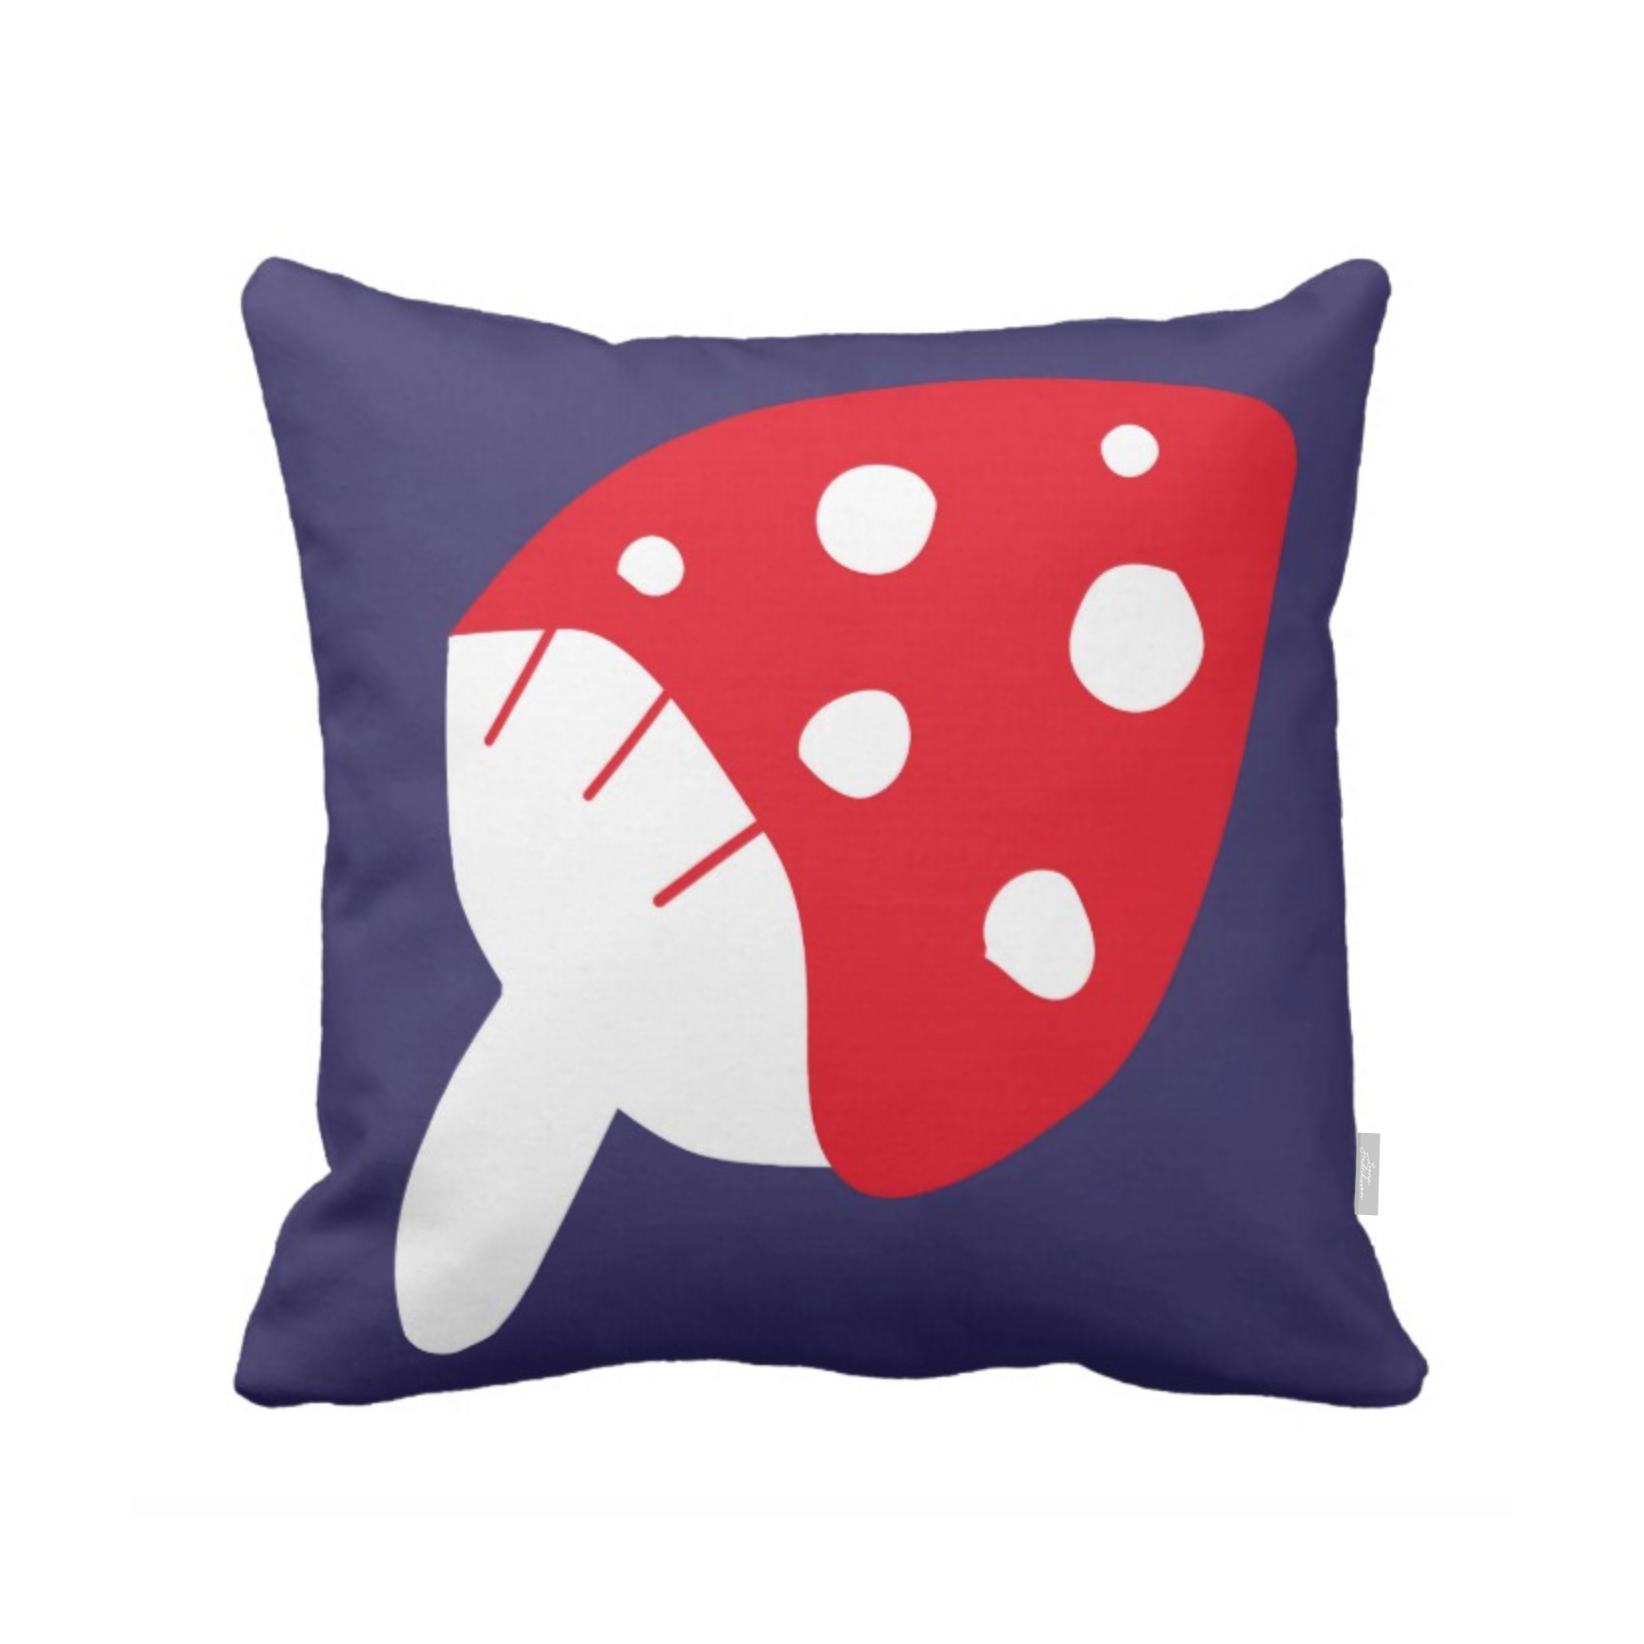 ISLET mushroom,  pillow, blueberry